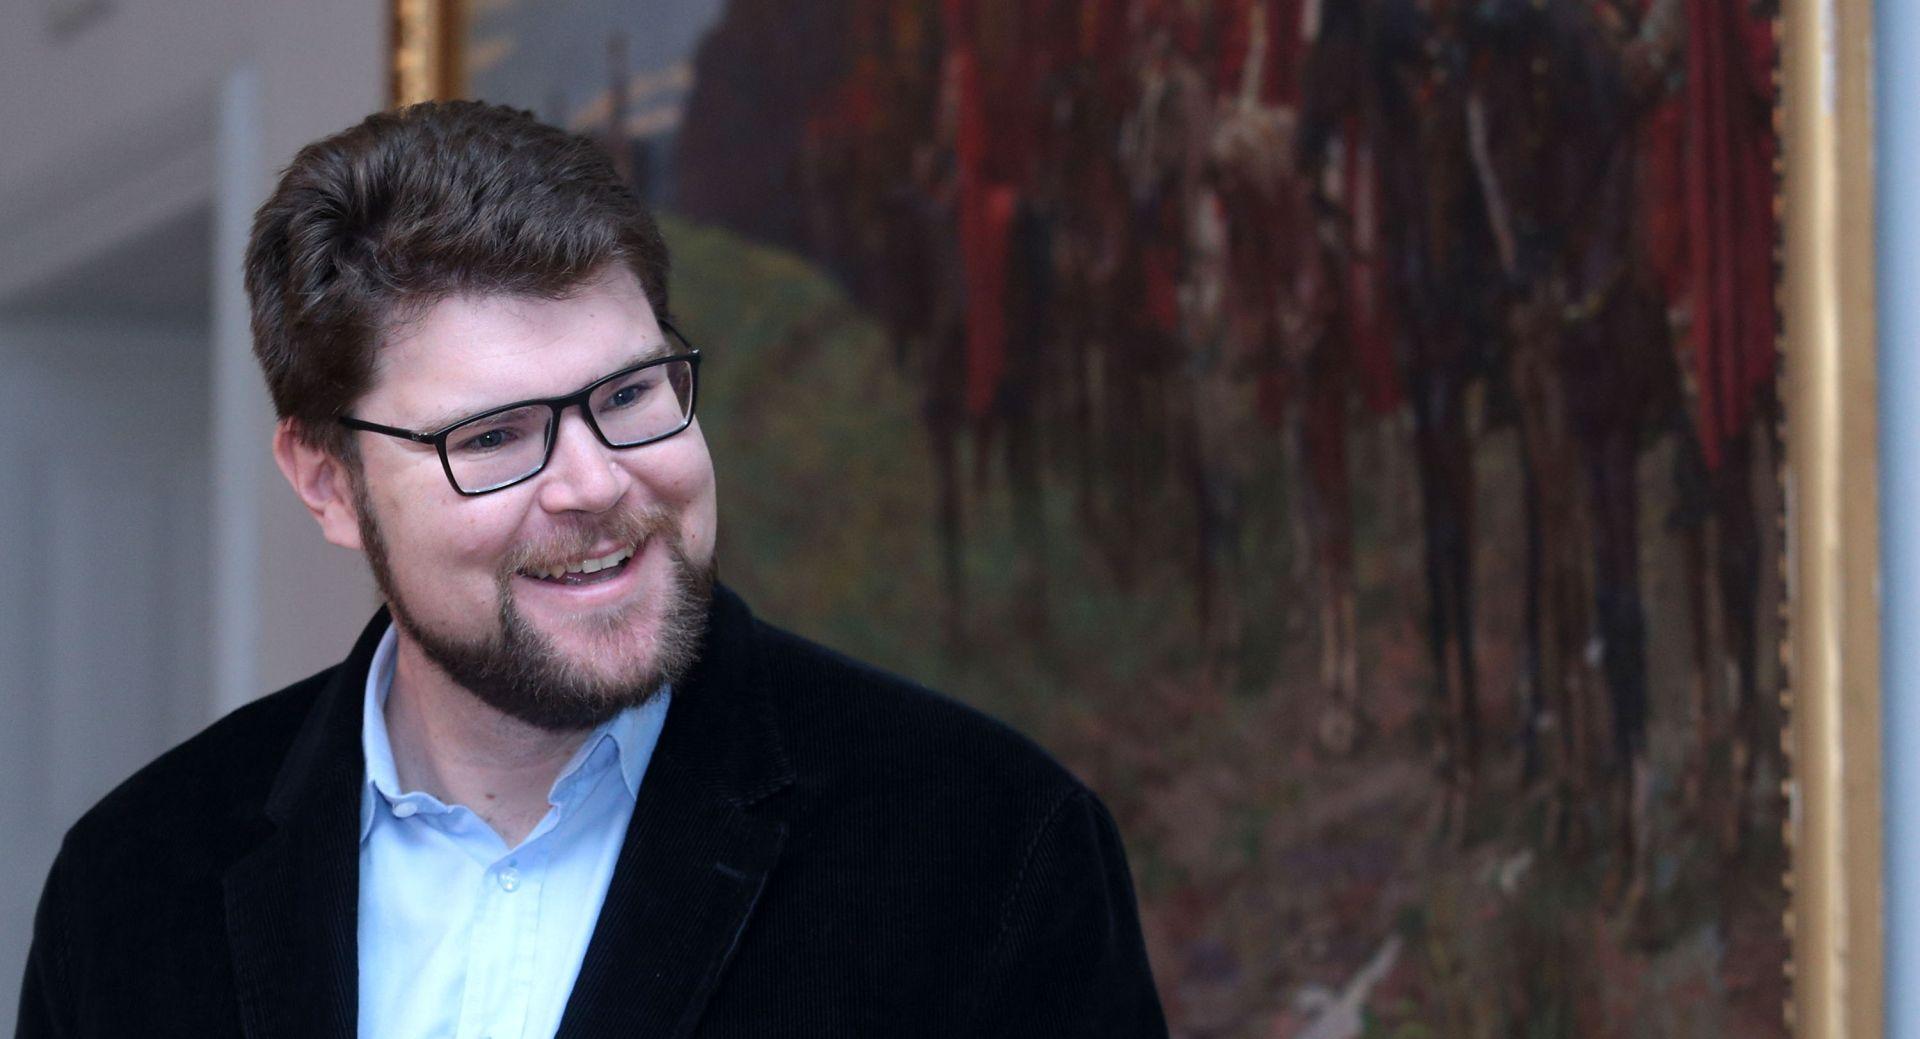 Grbin se slaže s Piculom: Raspuštanje splitskoga SDP-a dugoročni proces građenja političkog identiteta stranke